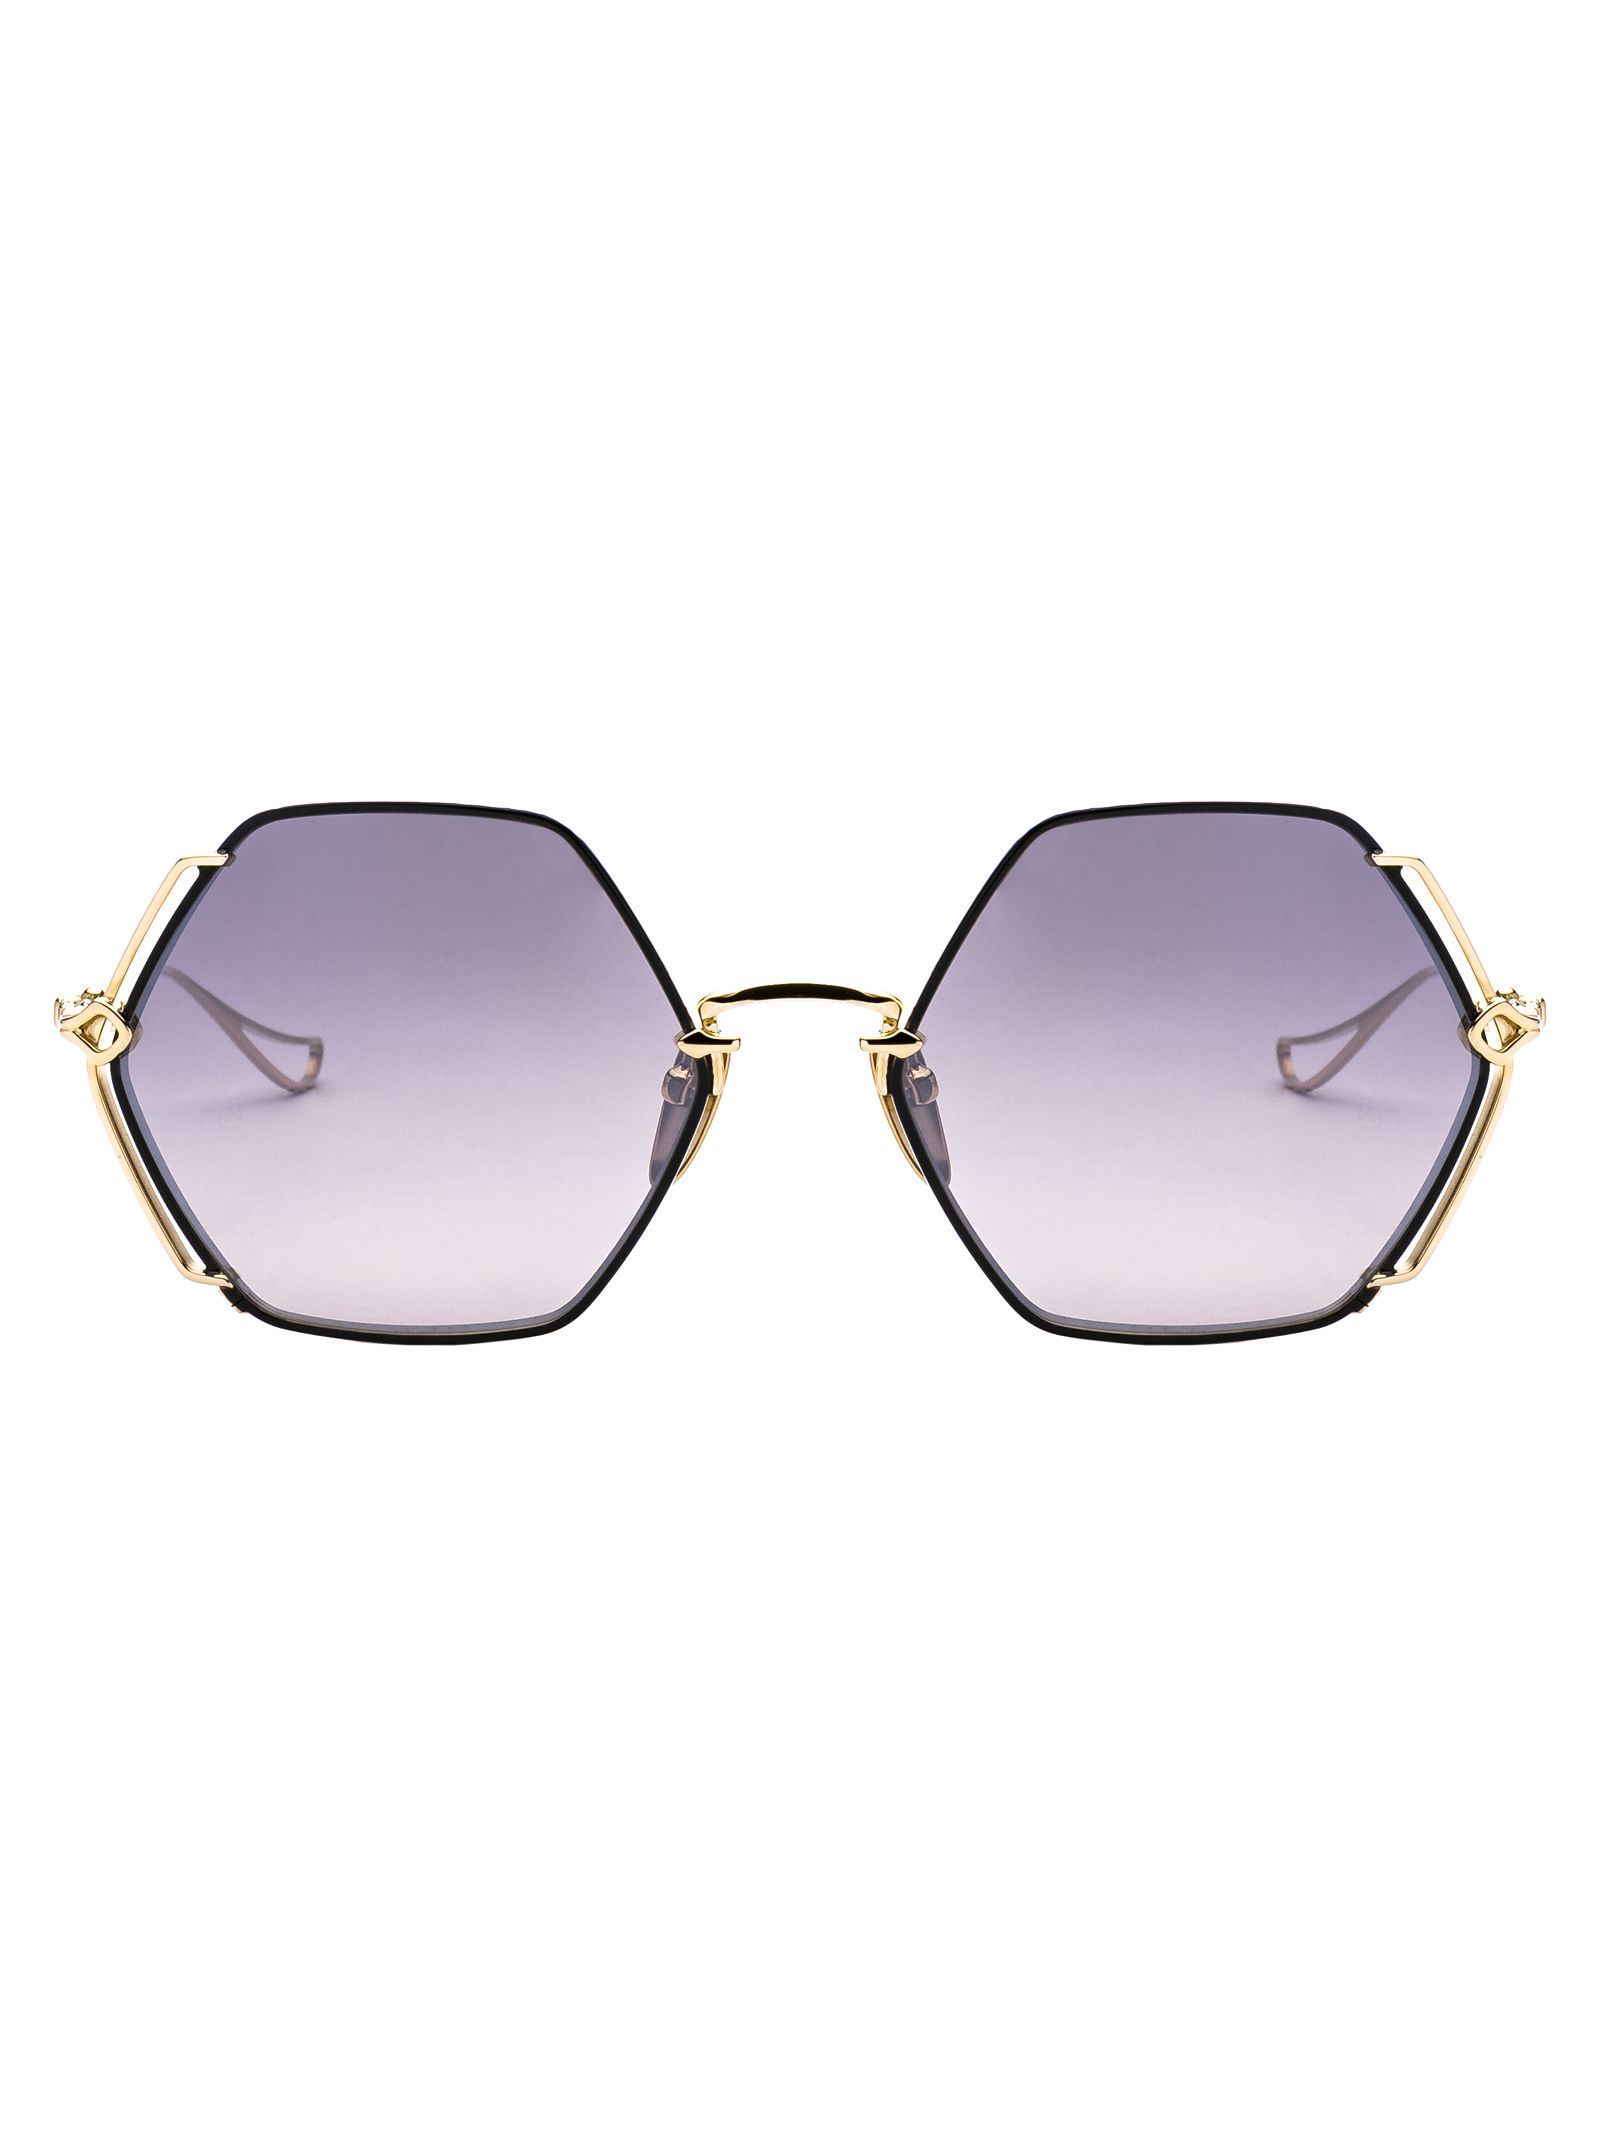 CHROME HEARTS Oversized Sunglasses in Sbkgp